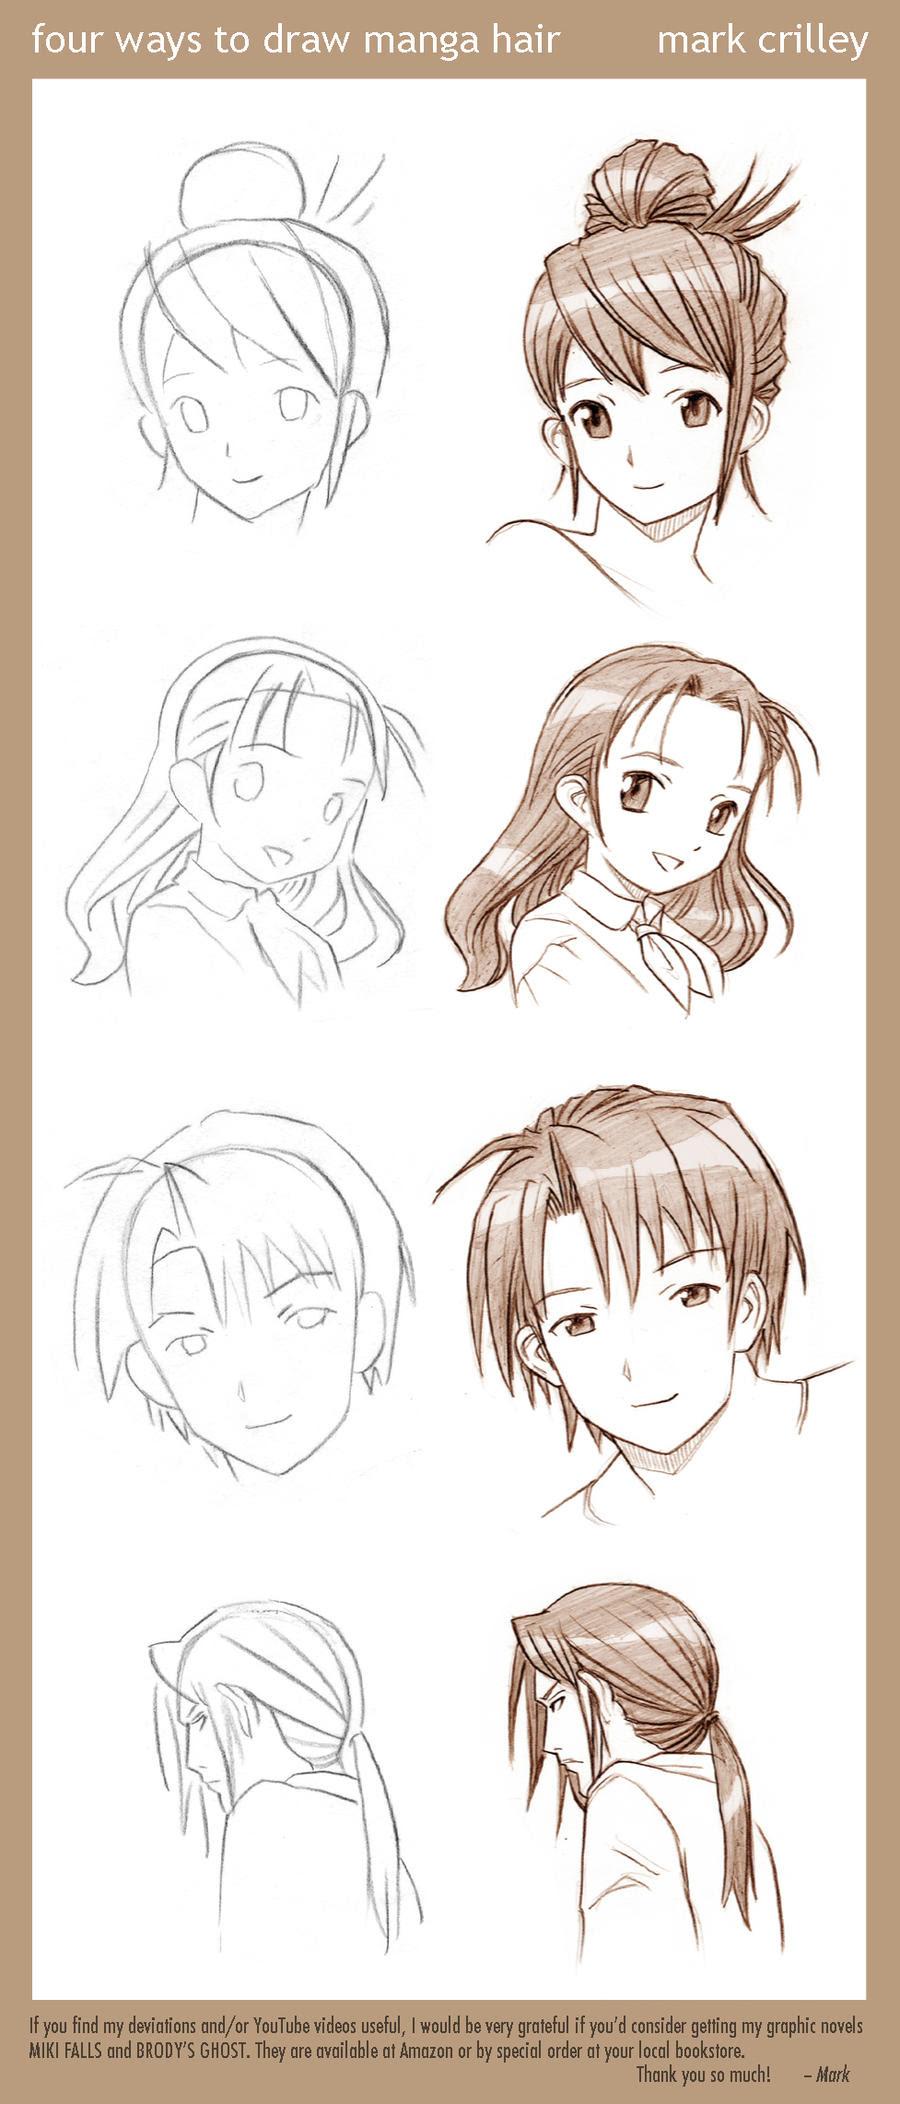 4 Ways to Draw Manga Hair | How To Draw Manga